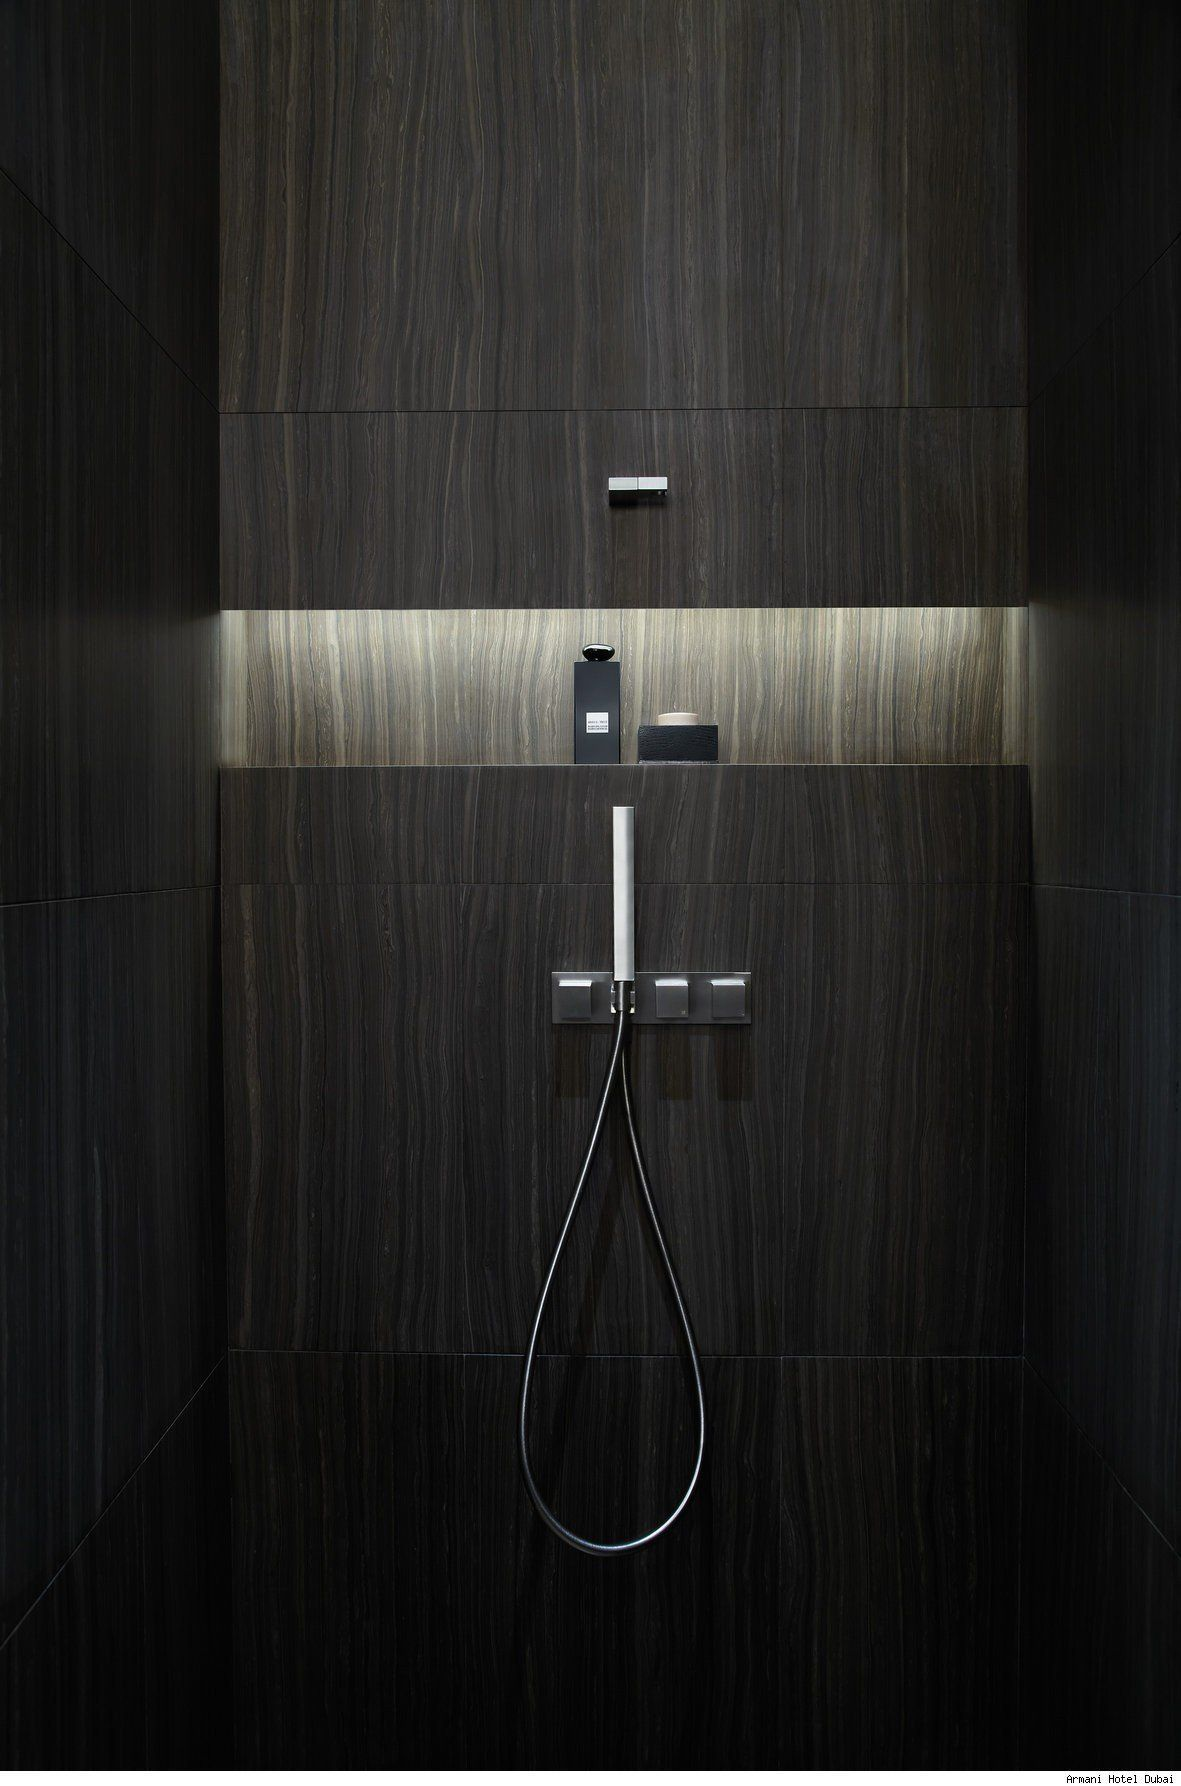 Armani Casa Shower Just Bathrooms Bathroom Niche Armani Hotel Armani Hotel Modern Shower Design Armani Hotel Dubai